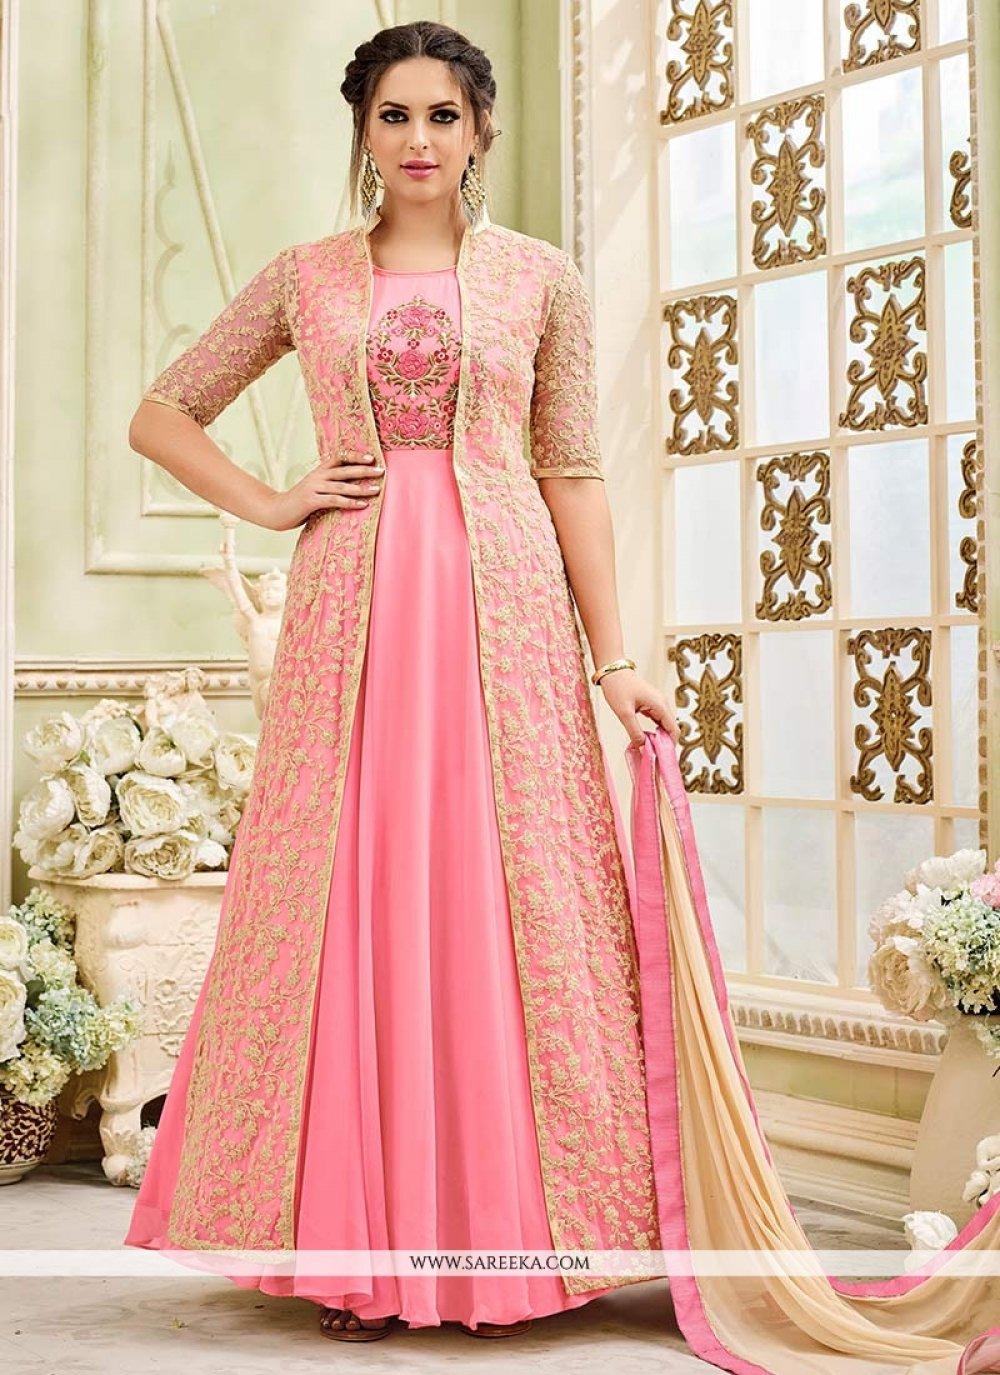 Embroidered Work Pink Faux Georgette Floor Length Anarkali Suit